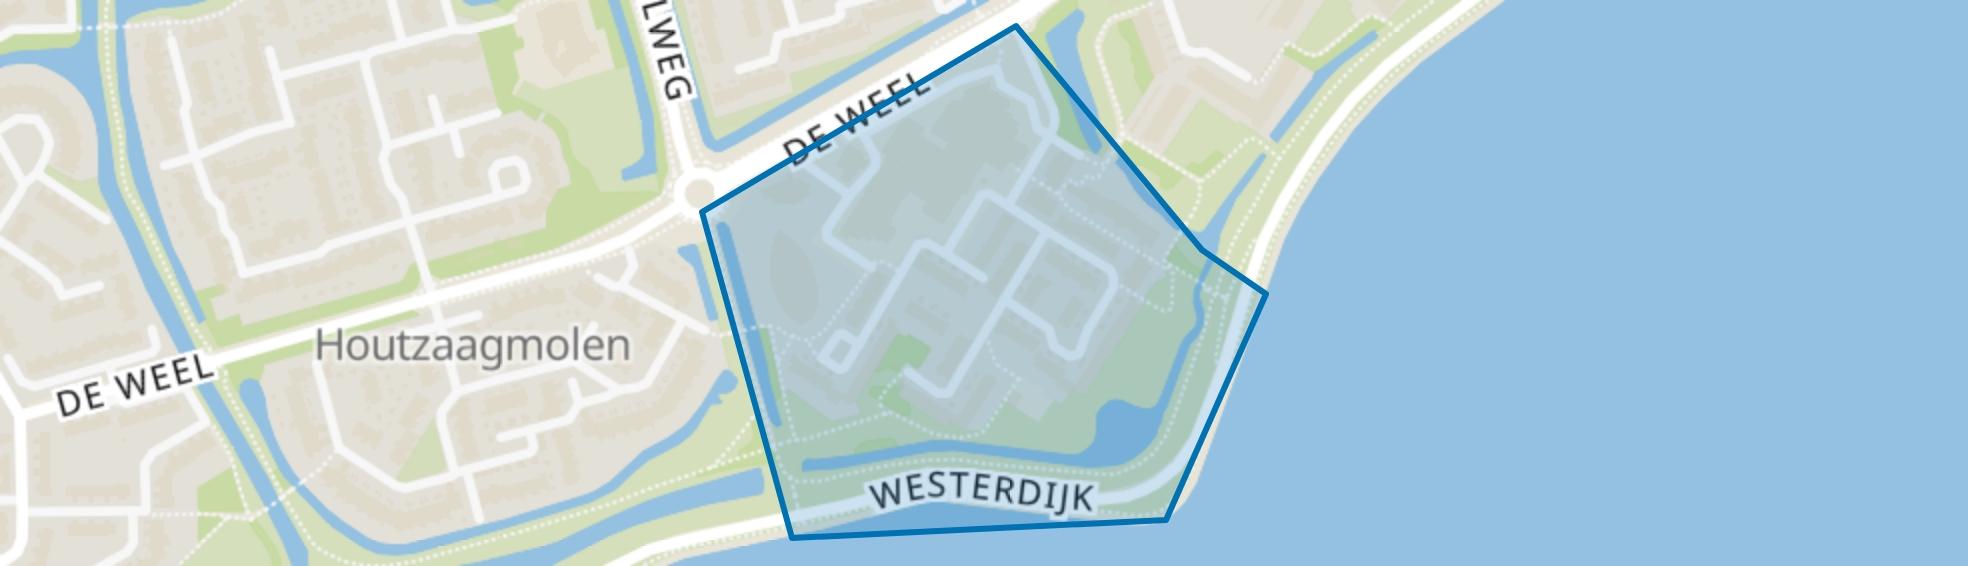 Grote Waal - Buurt 13 04, Hoorn (NH) map